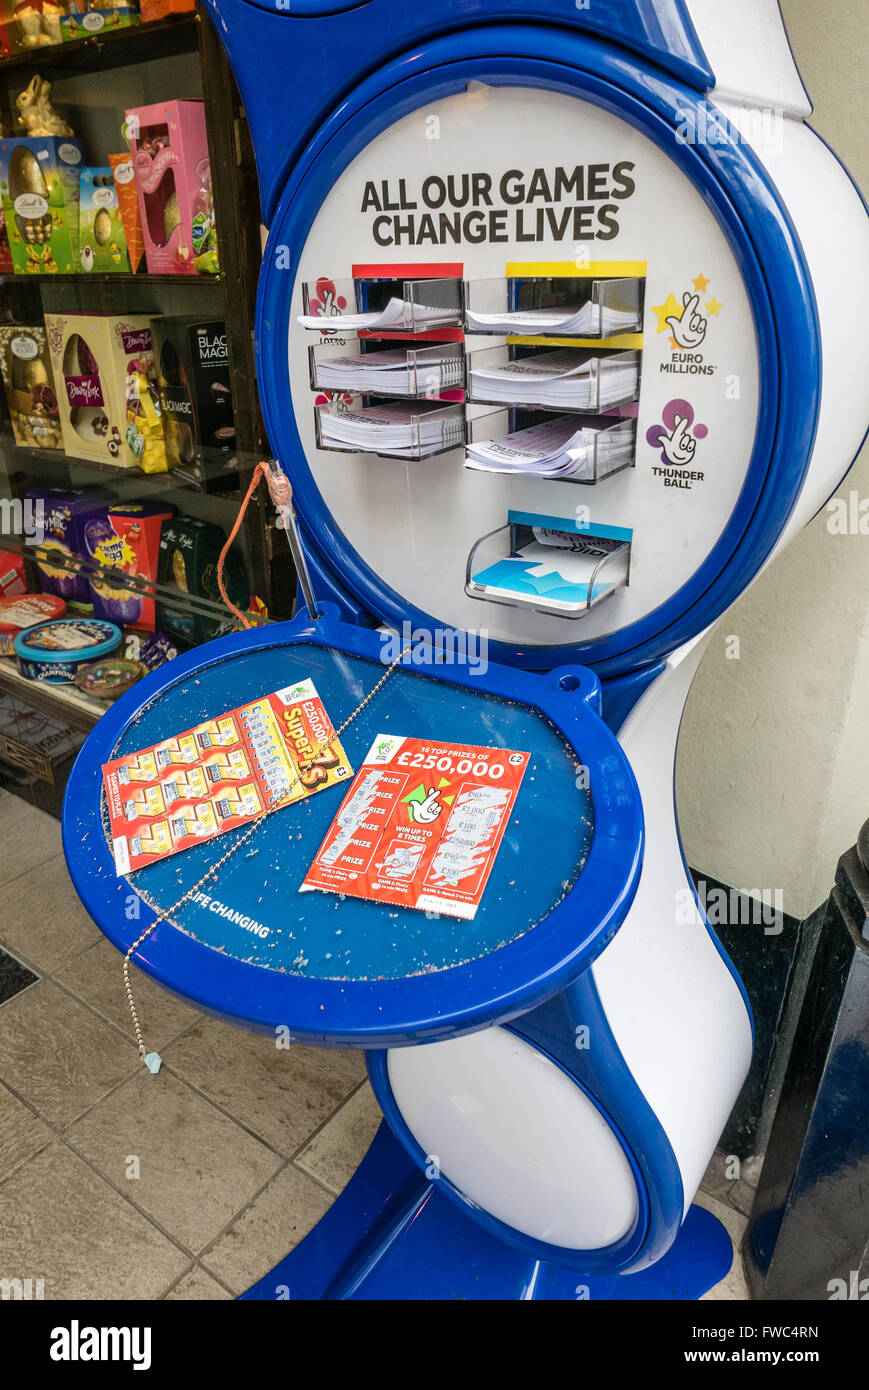 Law essay writer uk national lottery